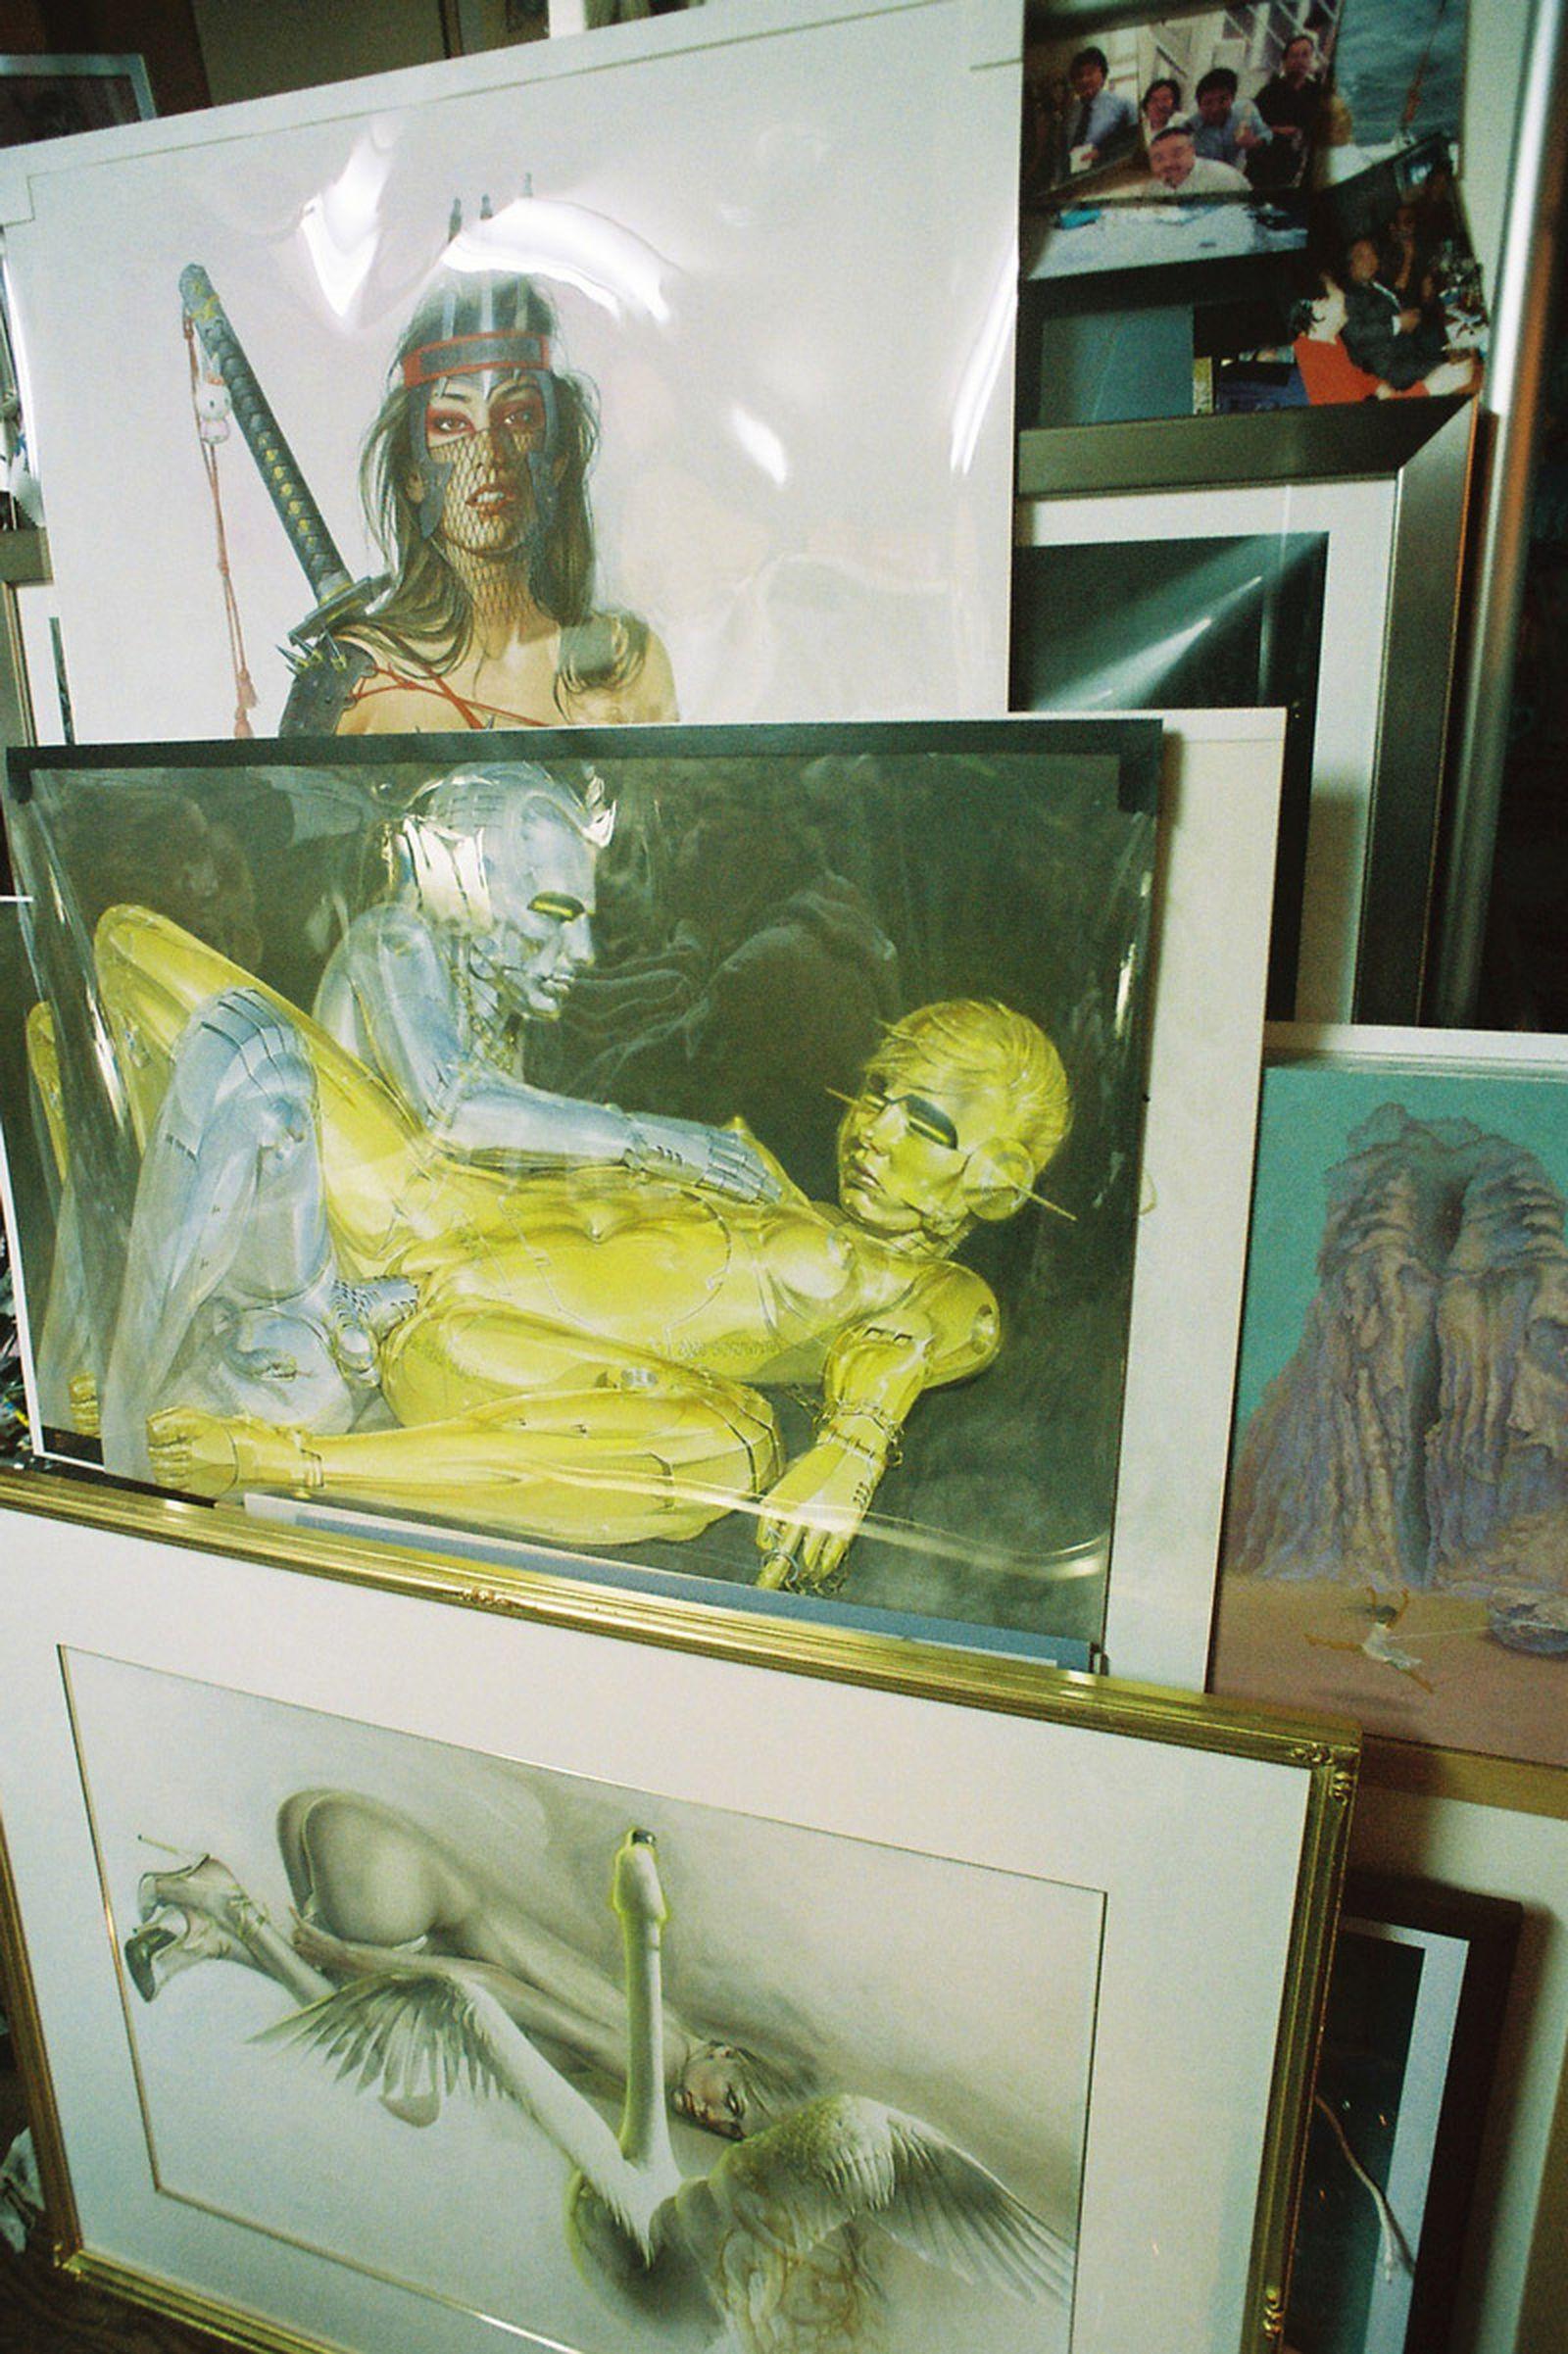 inside-the-erotic-sci-fi-grotto-of-hajime-sorayama-04